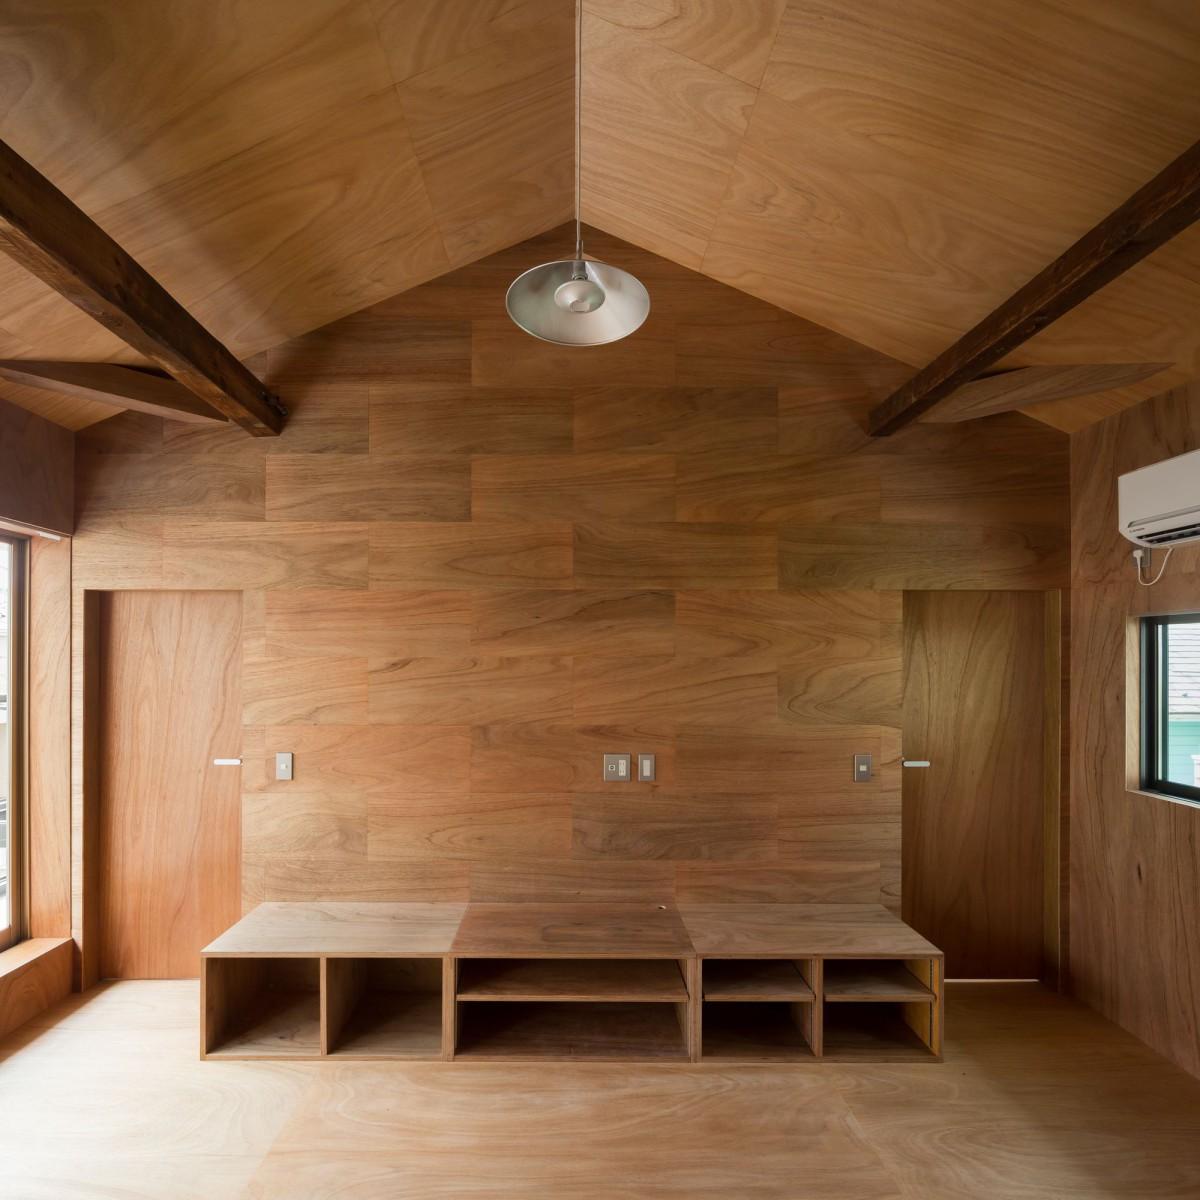 atelierco architects . 100 Year Lasting Earthen Floor (9)